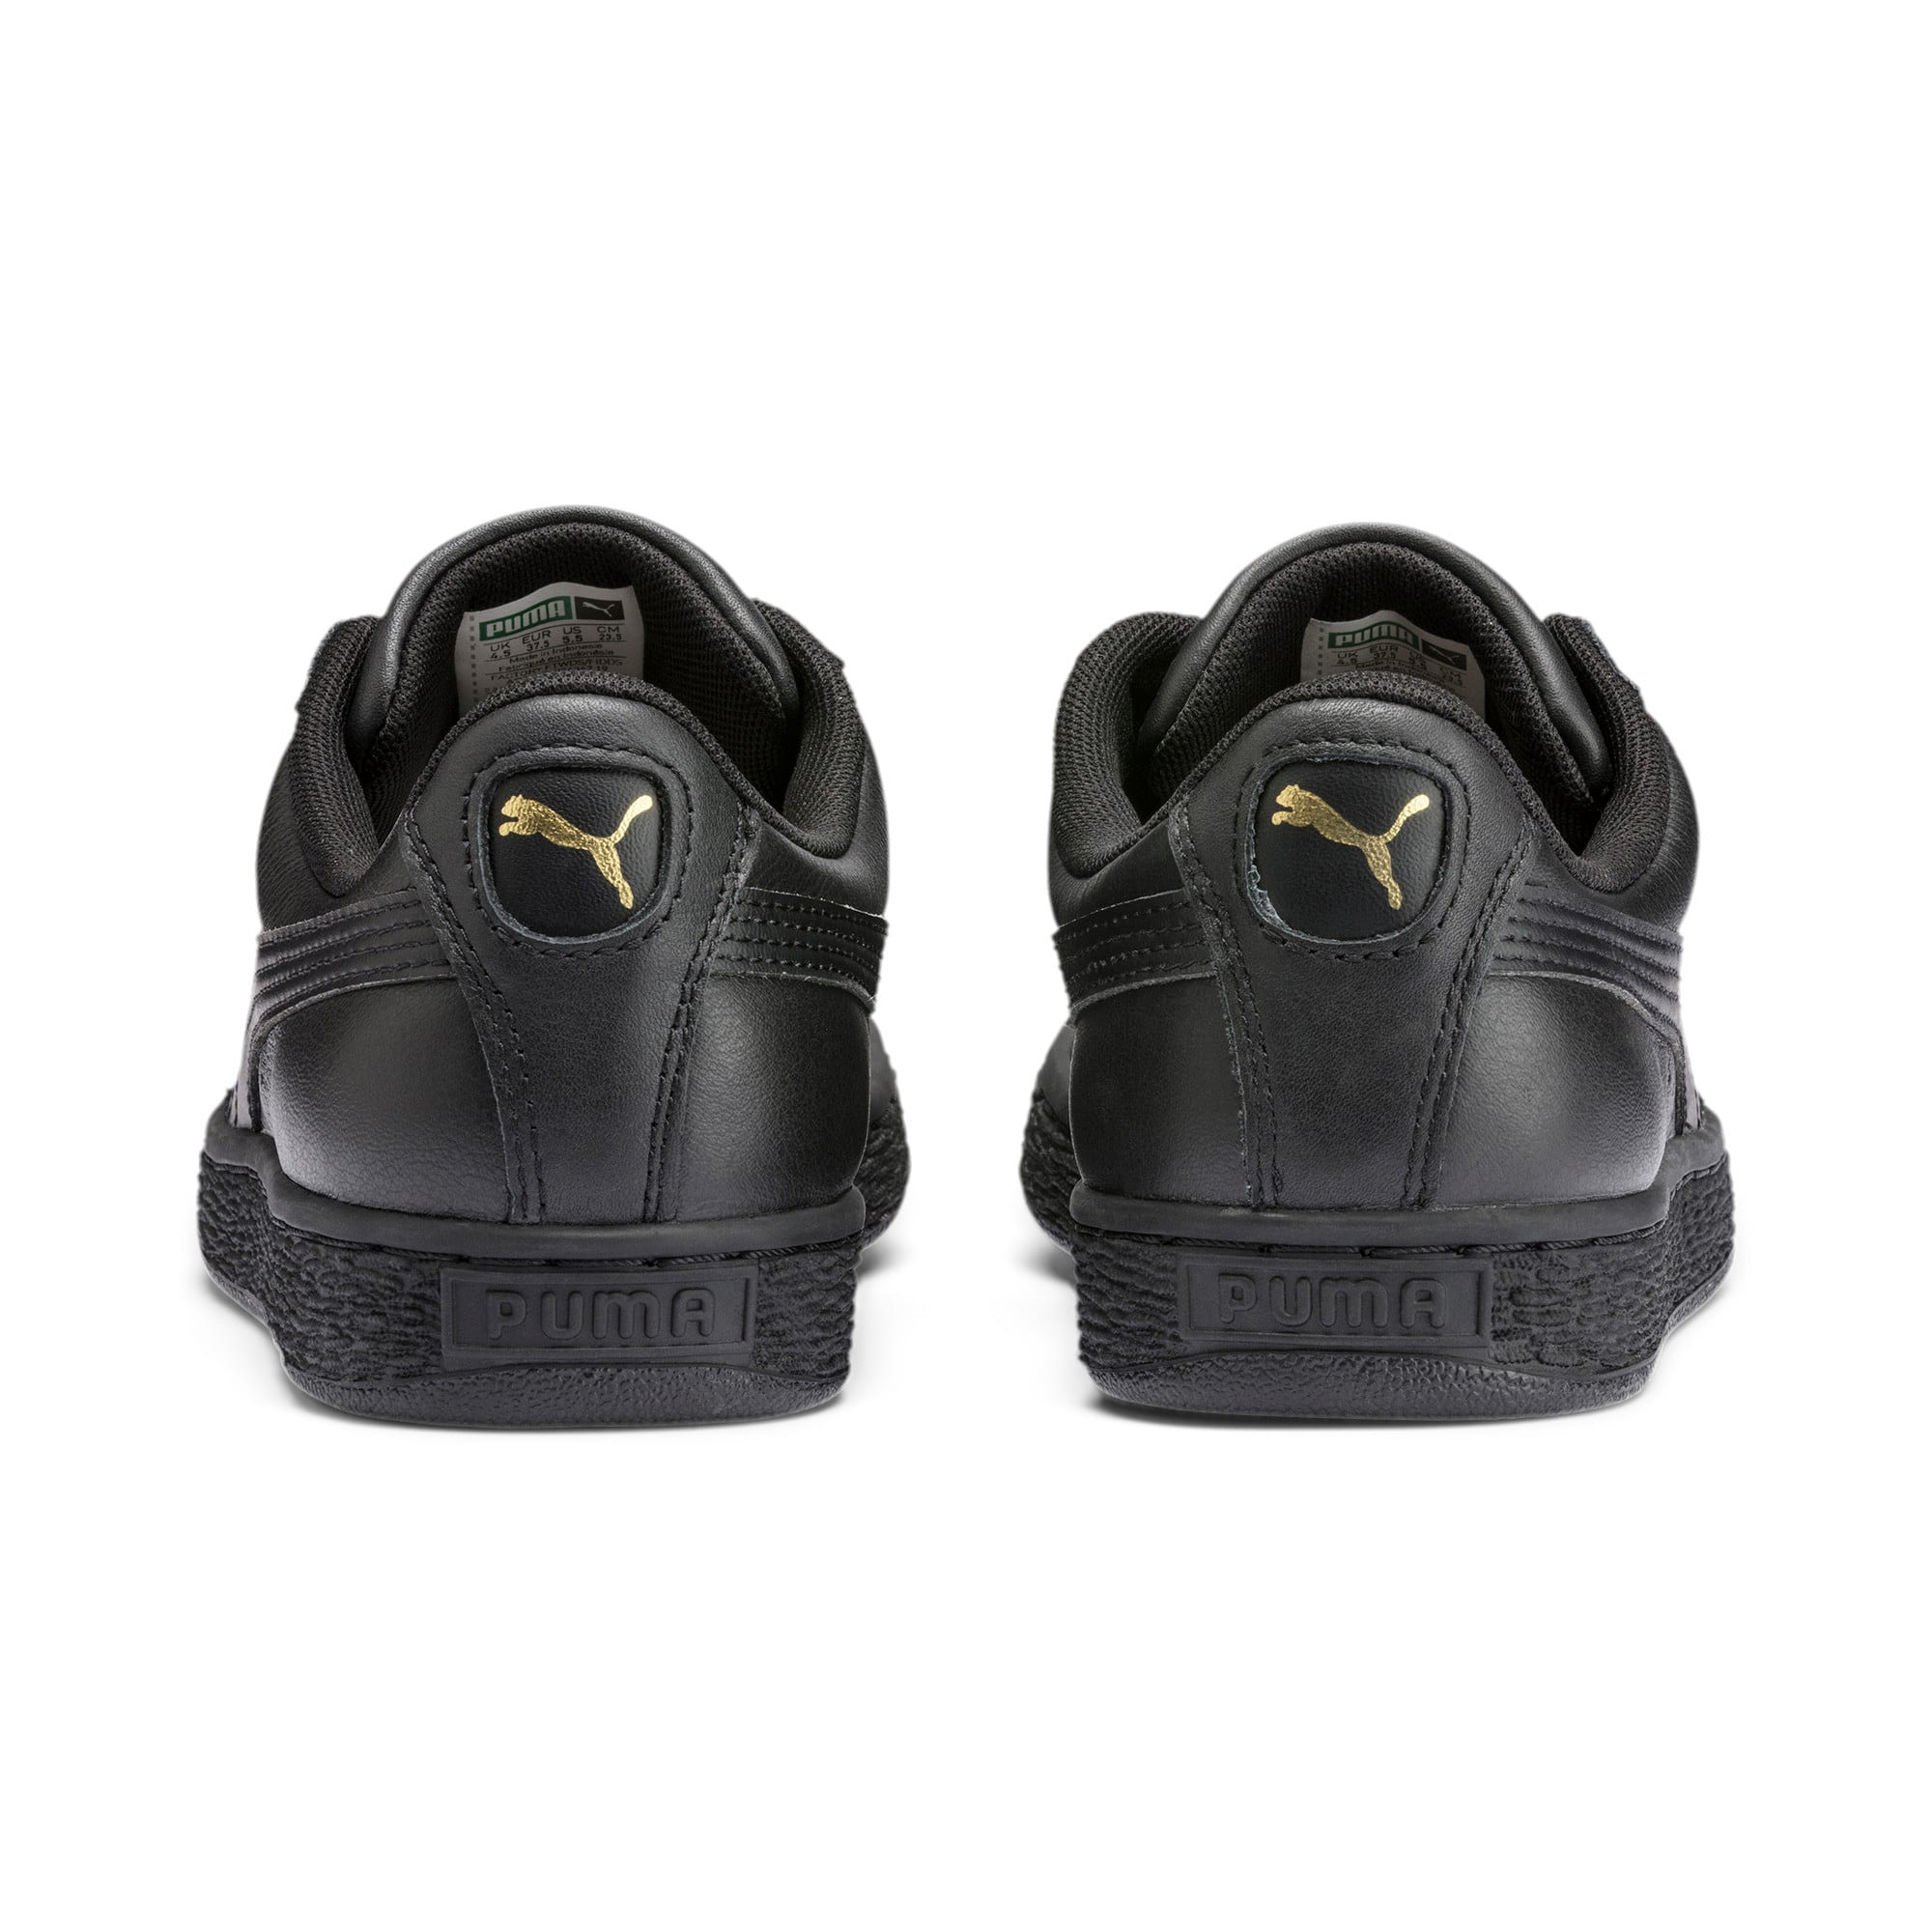 Thumbnail 3 of Basket Classic LFS Men's Shoes, black-team gold, medium